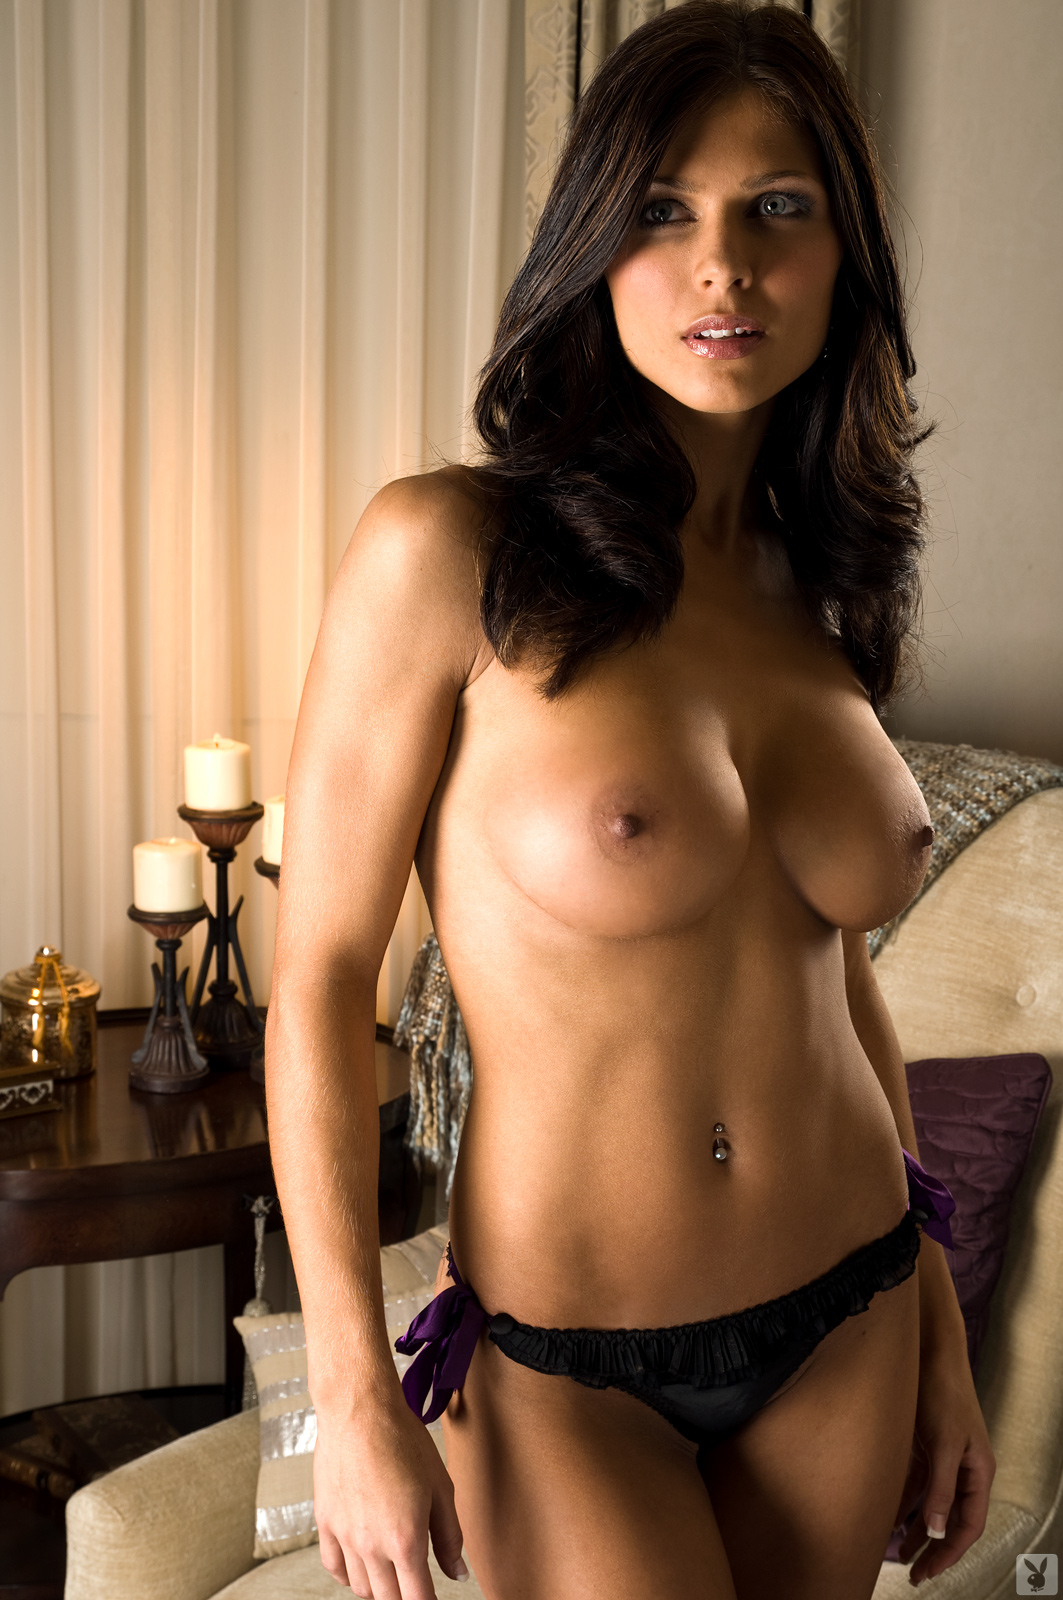 Divas stacy keibler torrie wilson naked